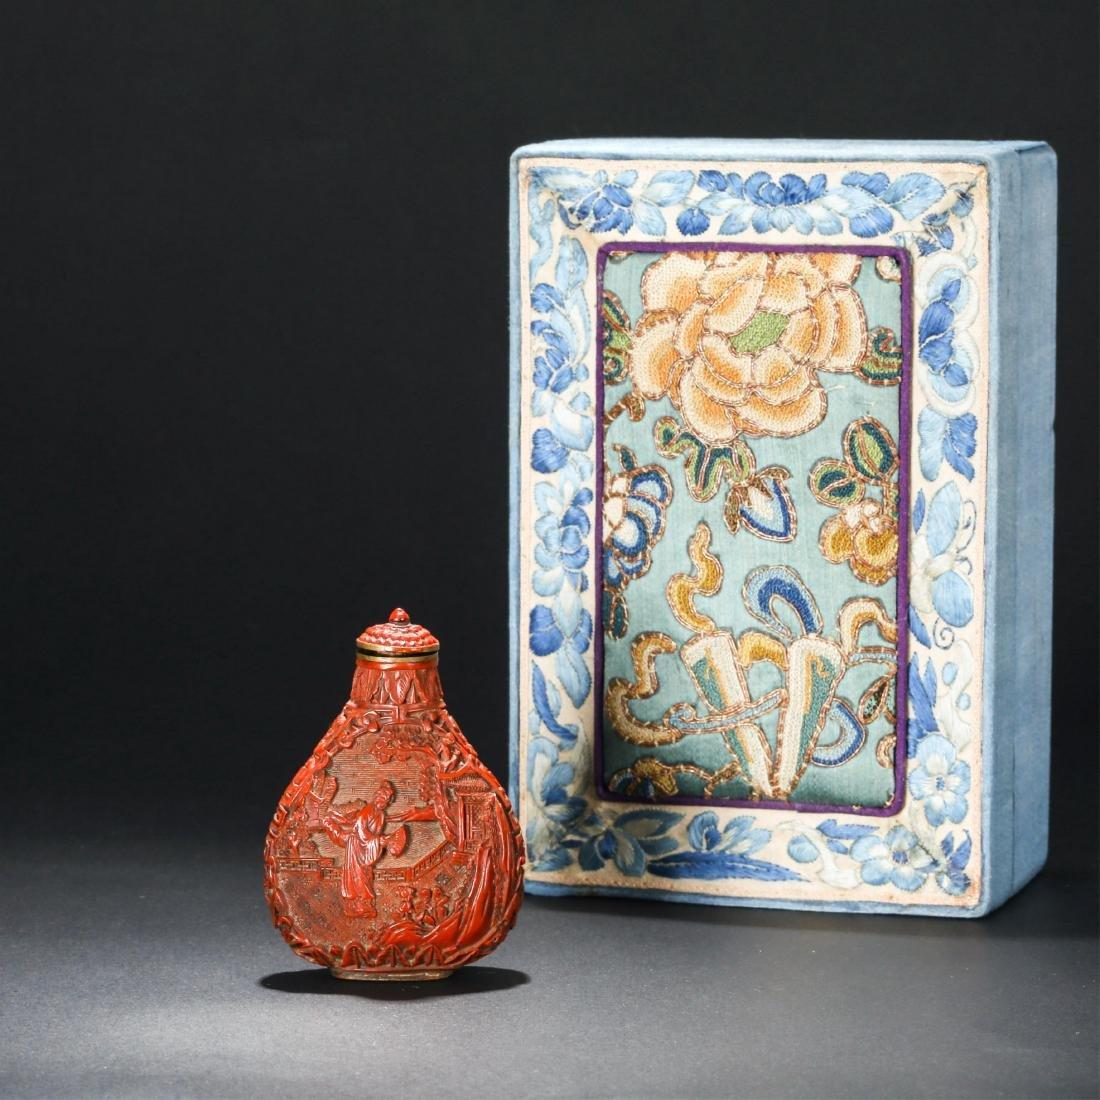 CHINESE CINNABAR LACQUER SNUFF BOTTLE ORIGINAL BOX